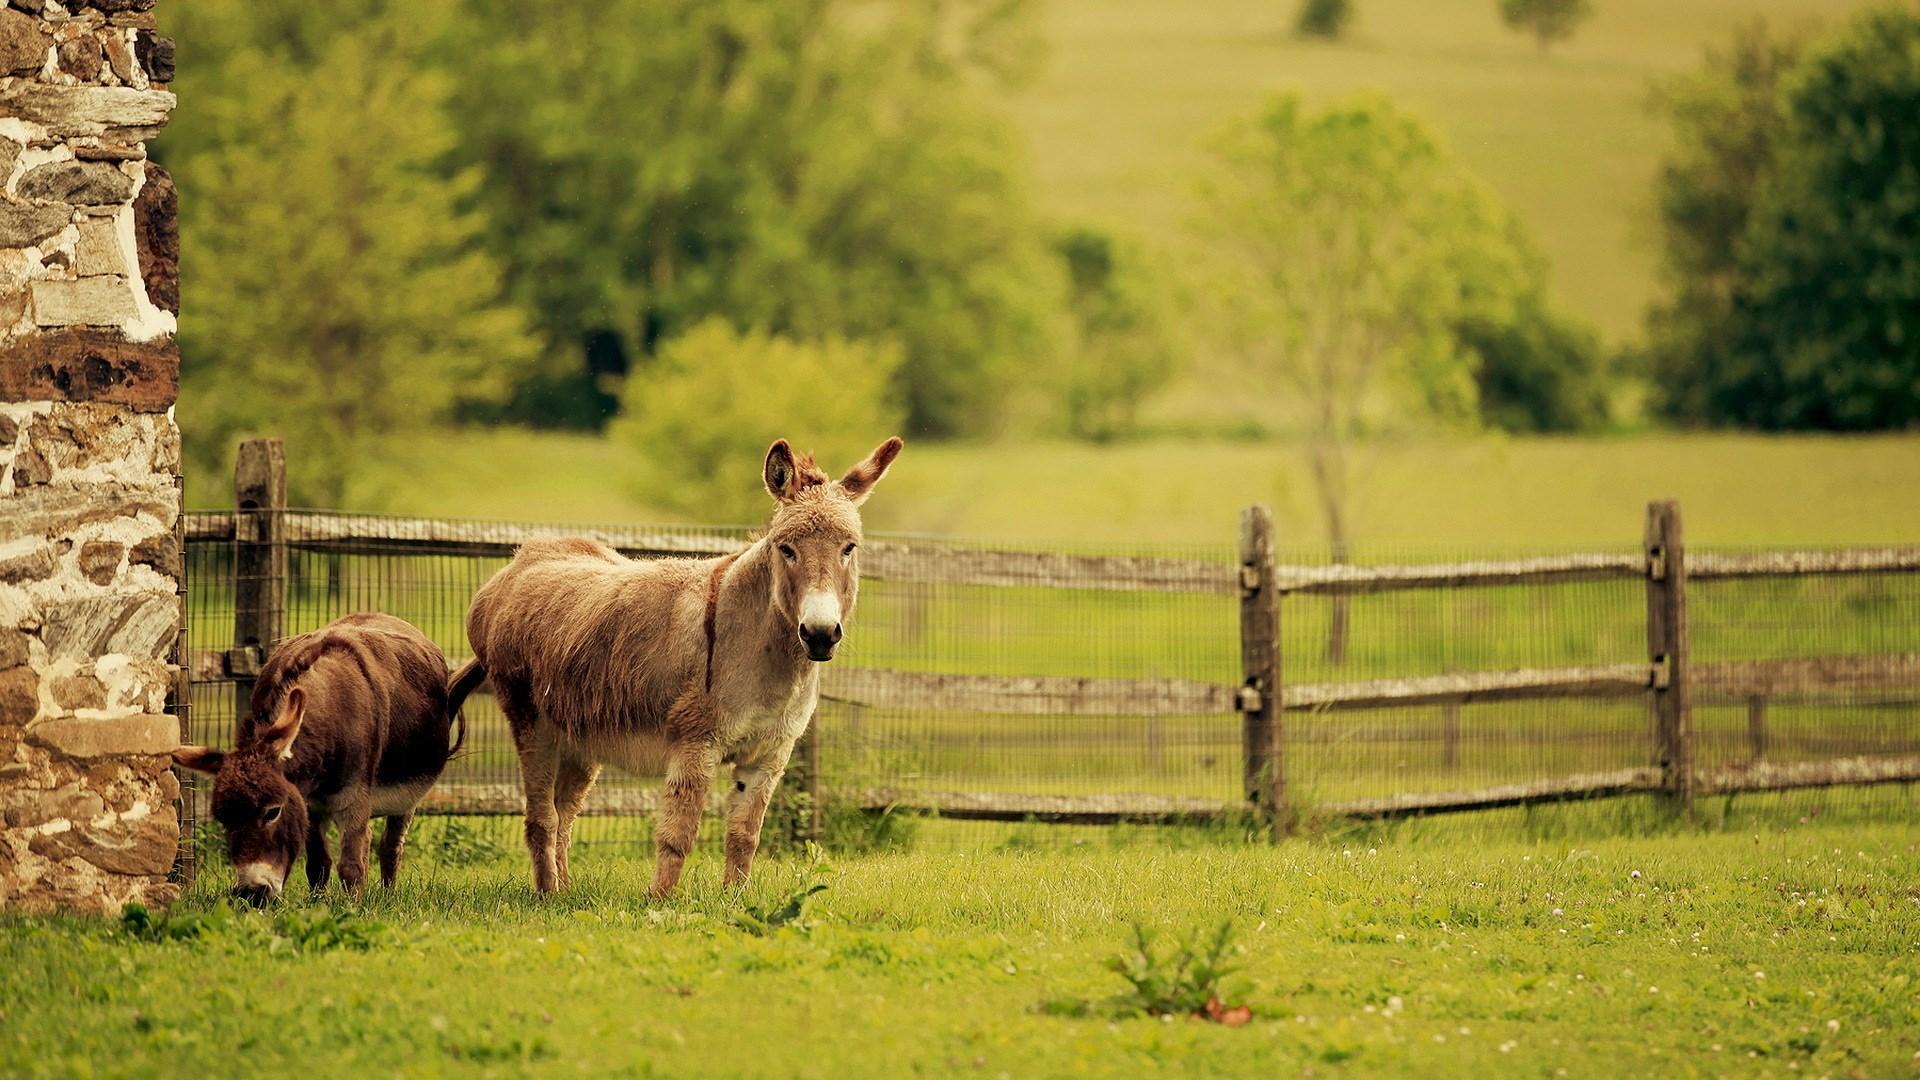 donkeys wallpaper